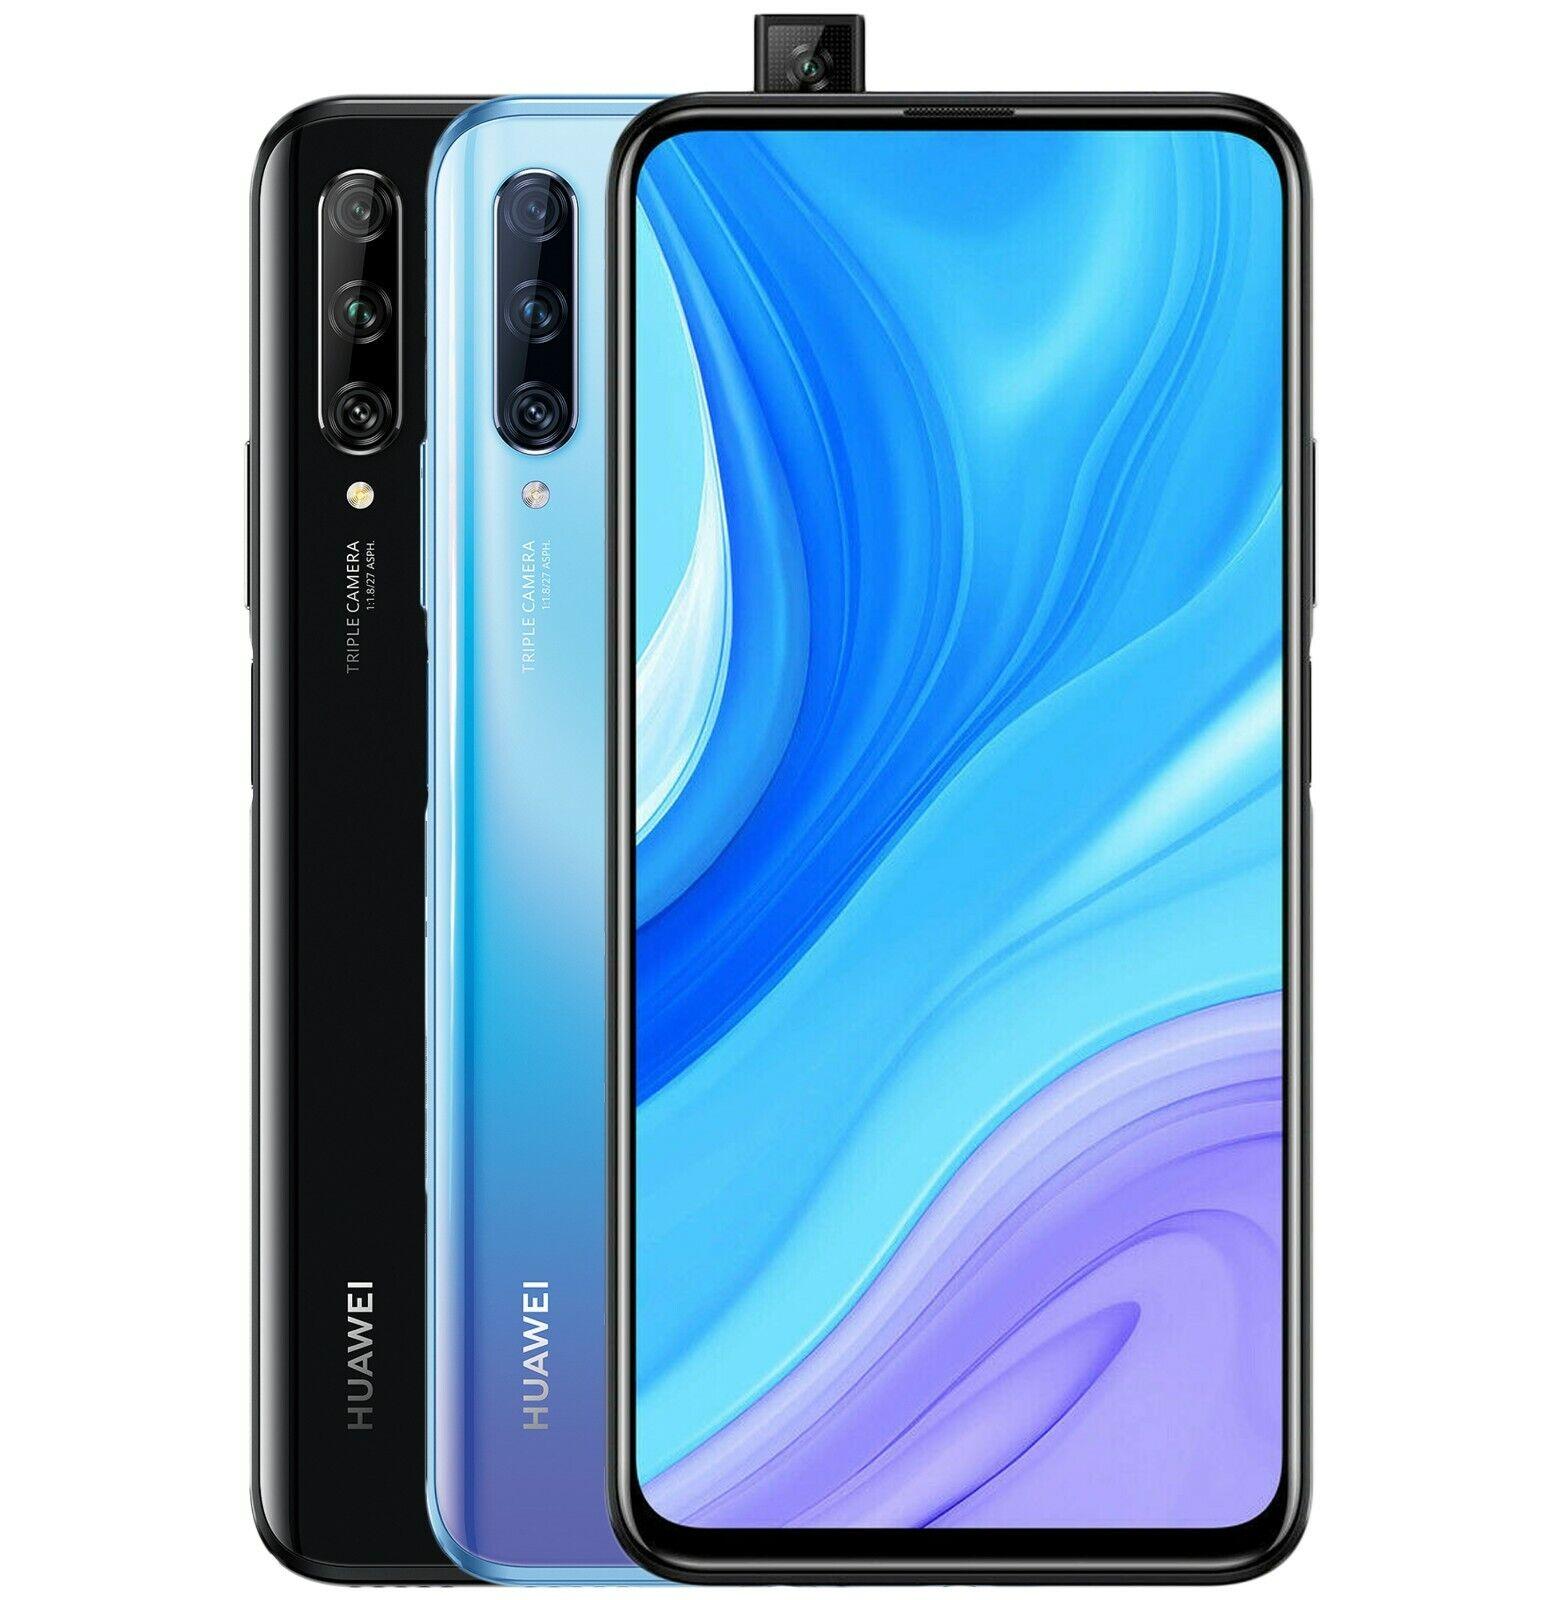 Huawei Y9s STK-L22 128GB 6GB RAM Dual Sim (FACTORY UNLOCKED) 6.59